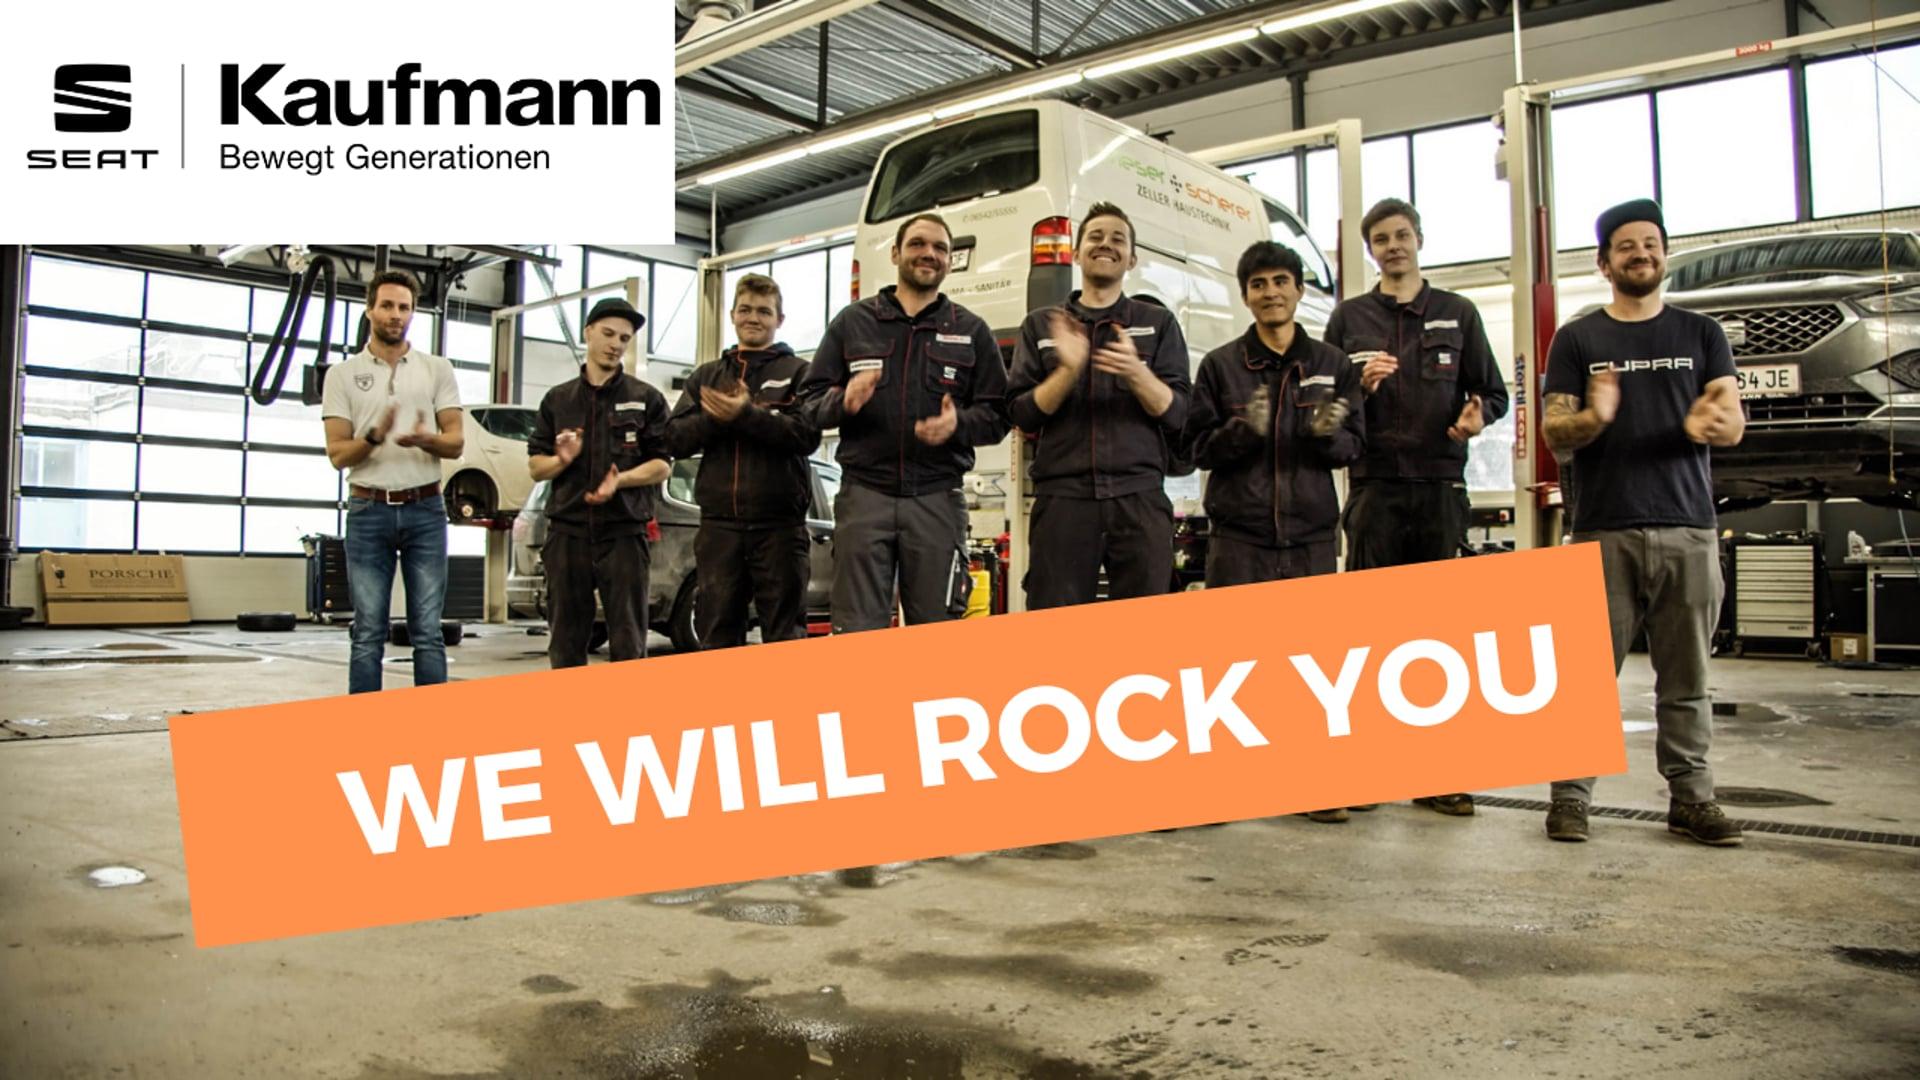 Seat Kaufmann - We will Rock You